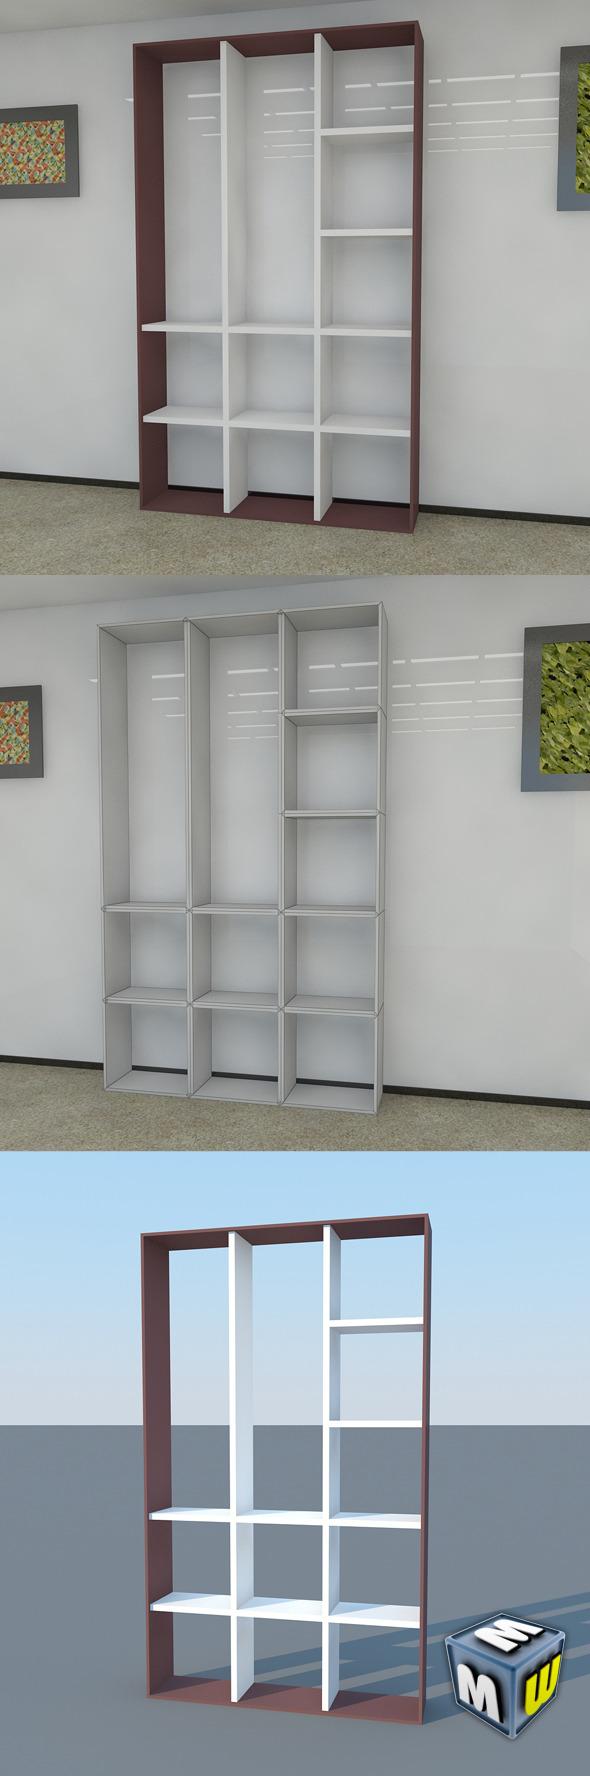 3DOcean Bookshelf 15 MAX 2011 5004345